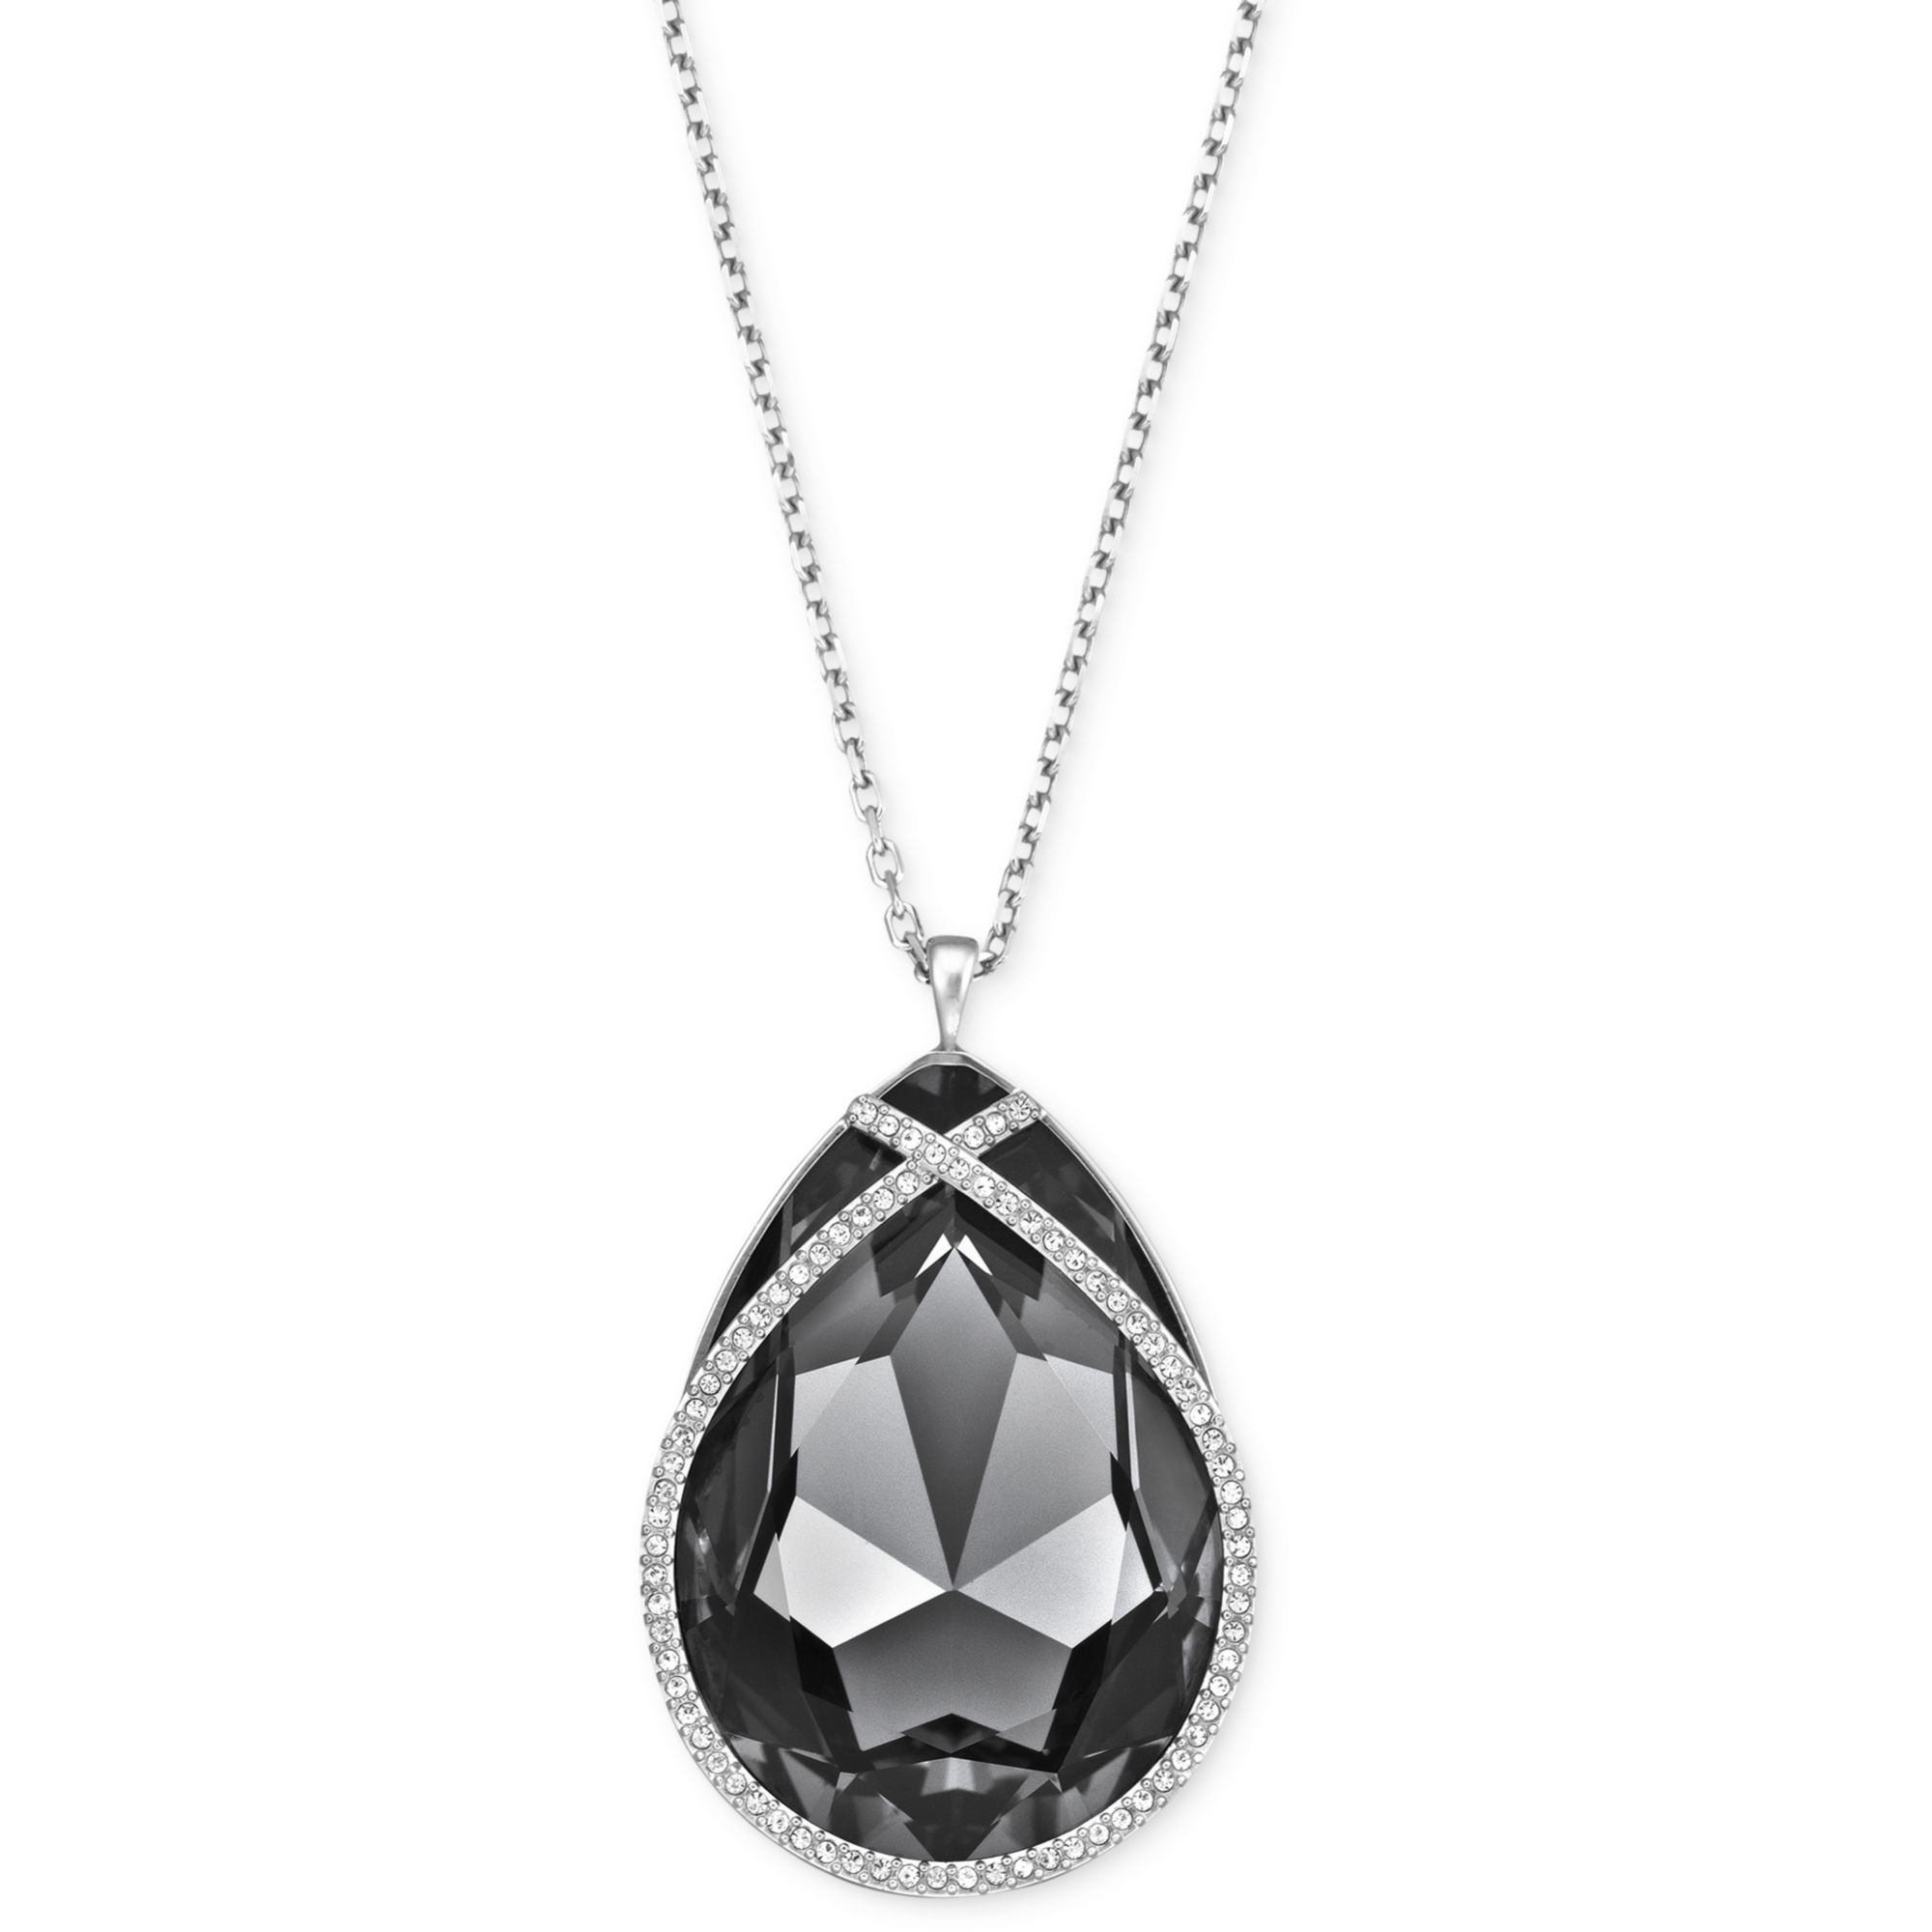 034a72084 Swarovski Rhodiumplated Black Crystal Teardrop Pendant Necklace in ...